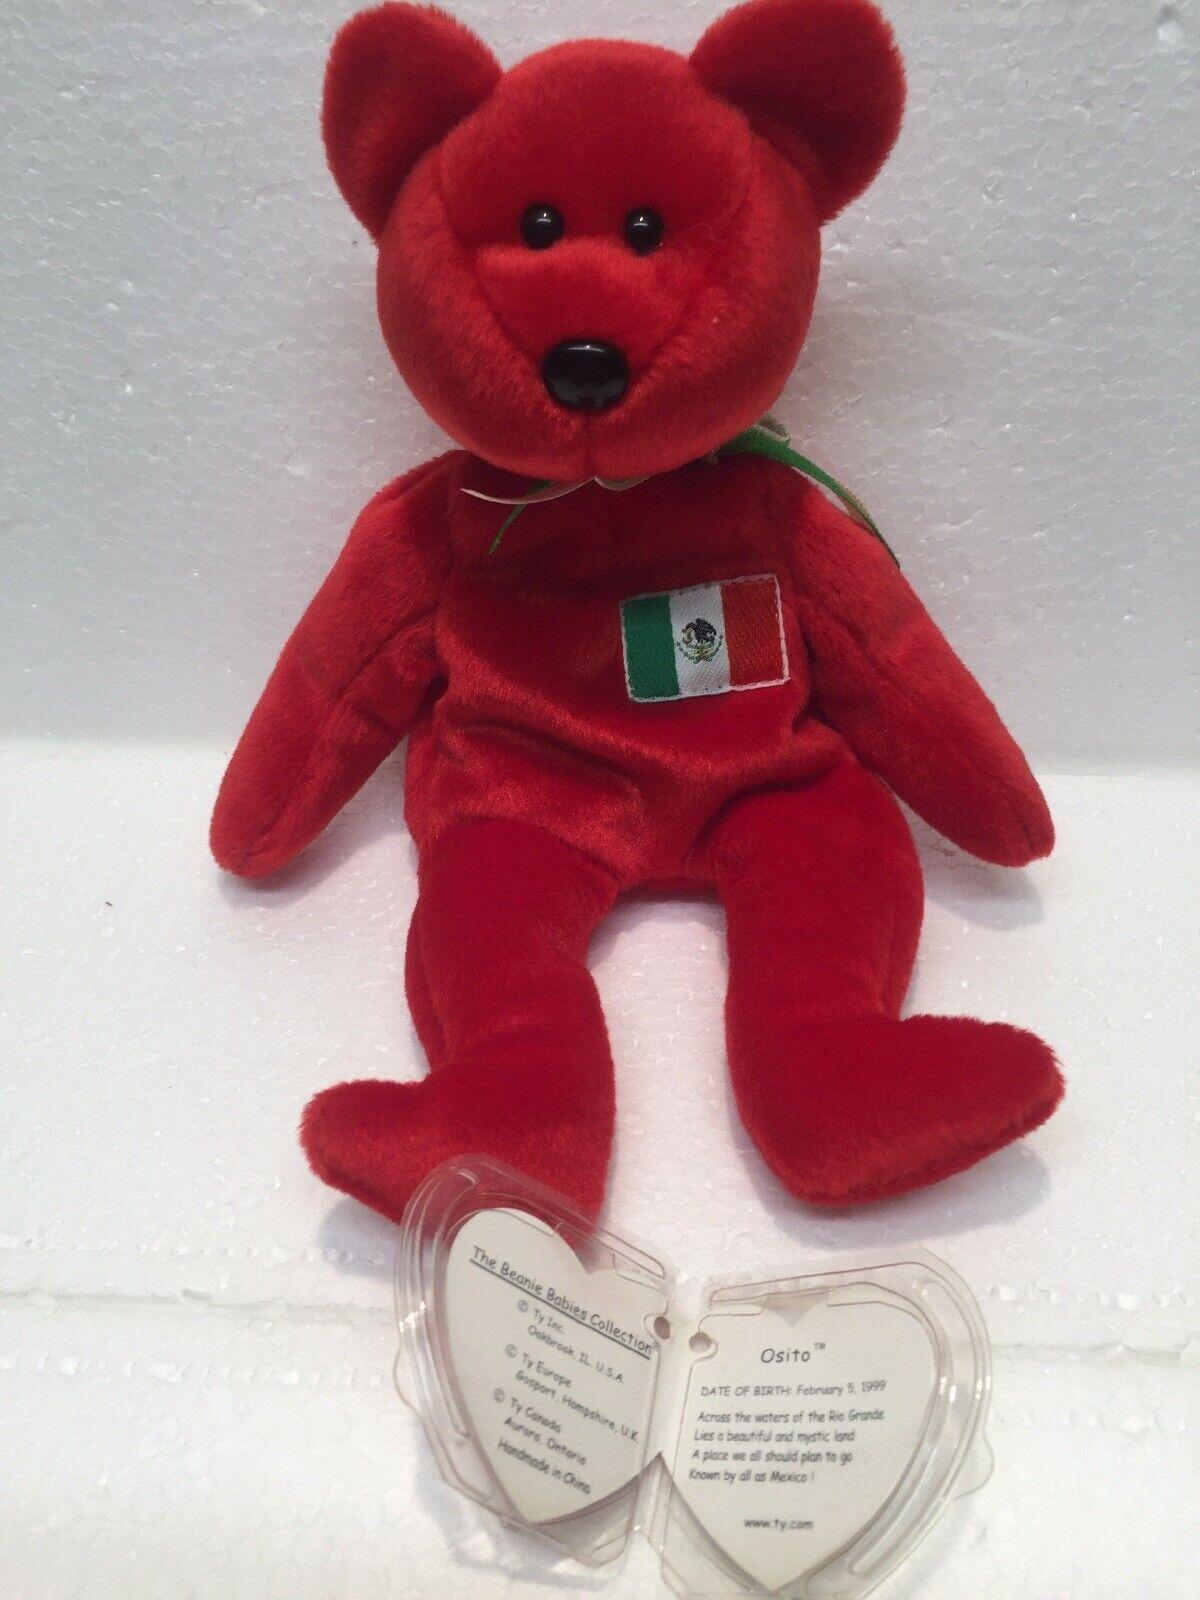 TY Beanie Baby - 1999 Osito Mexican Bear